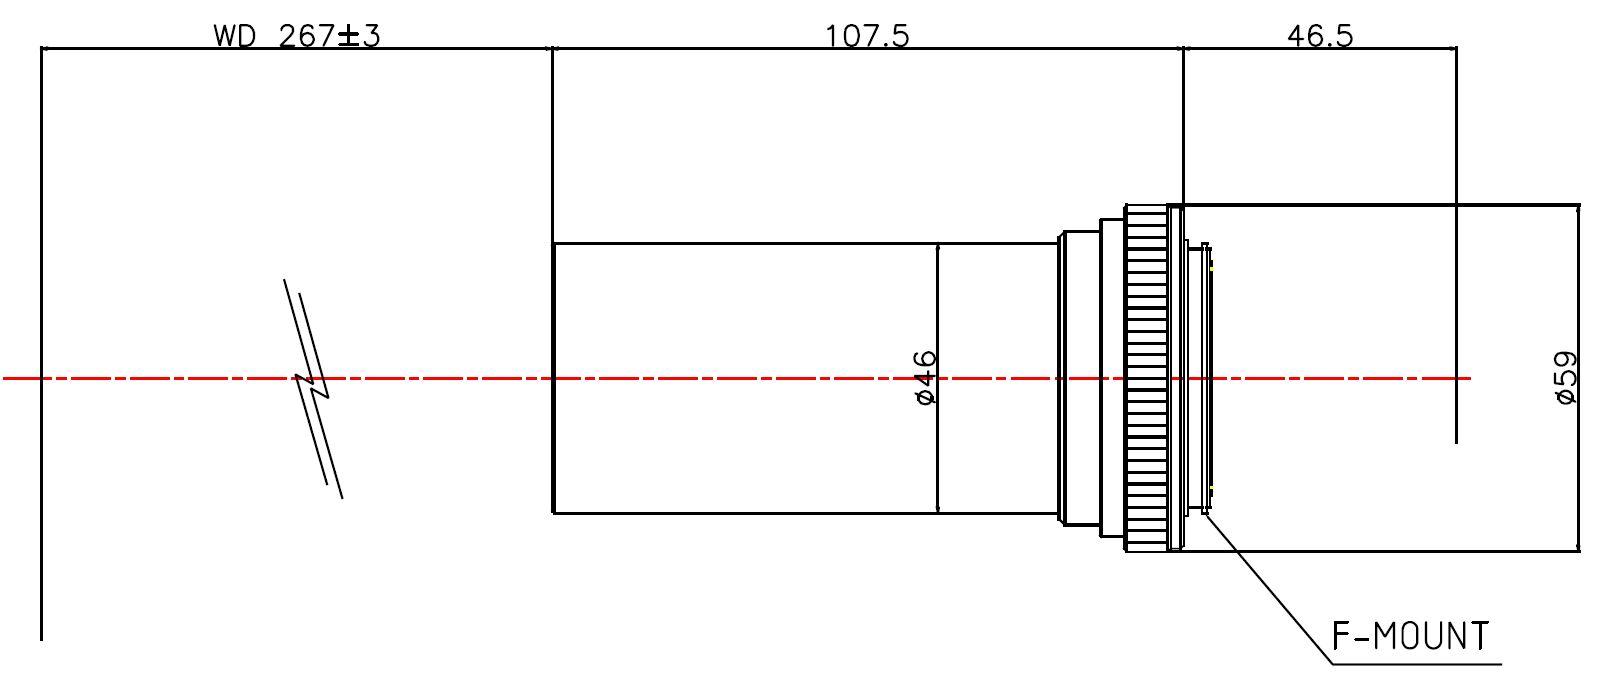 Lensagon MF8M-0247-267